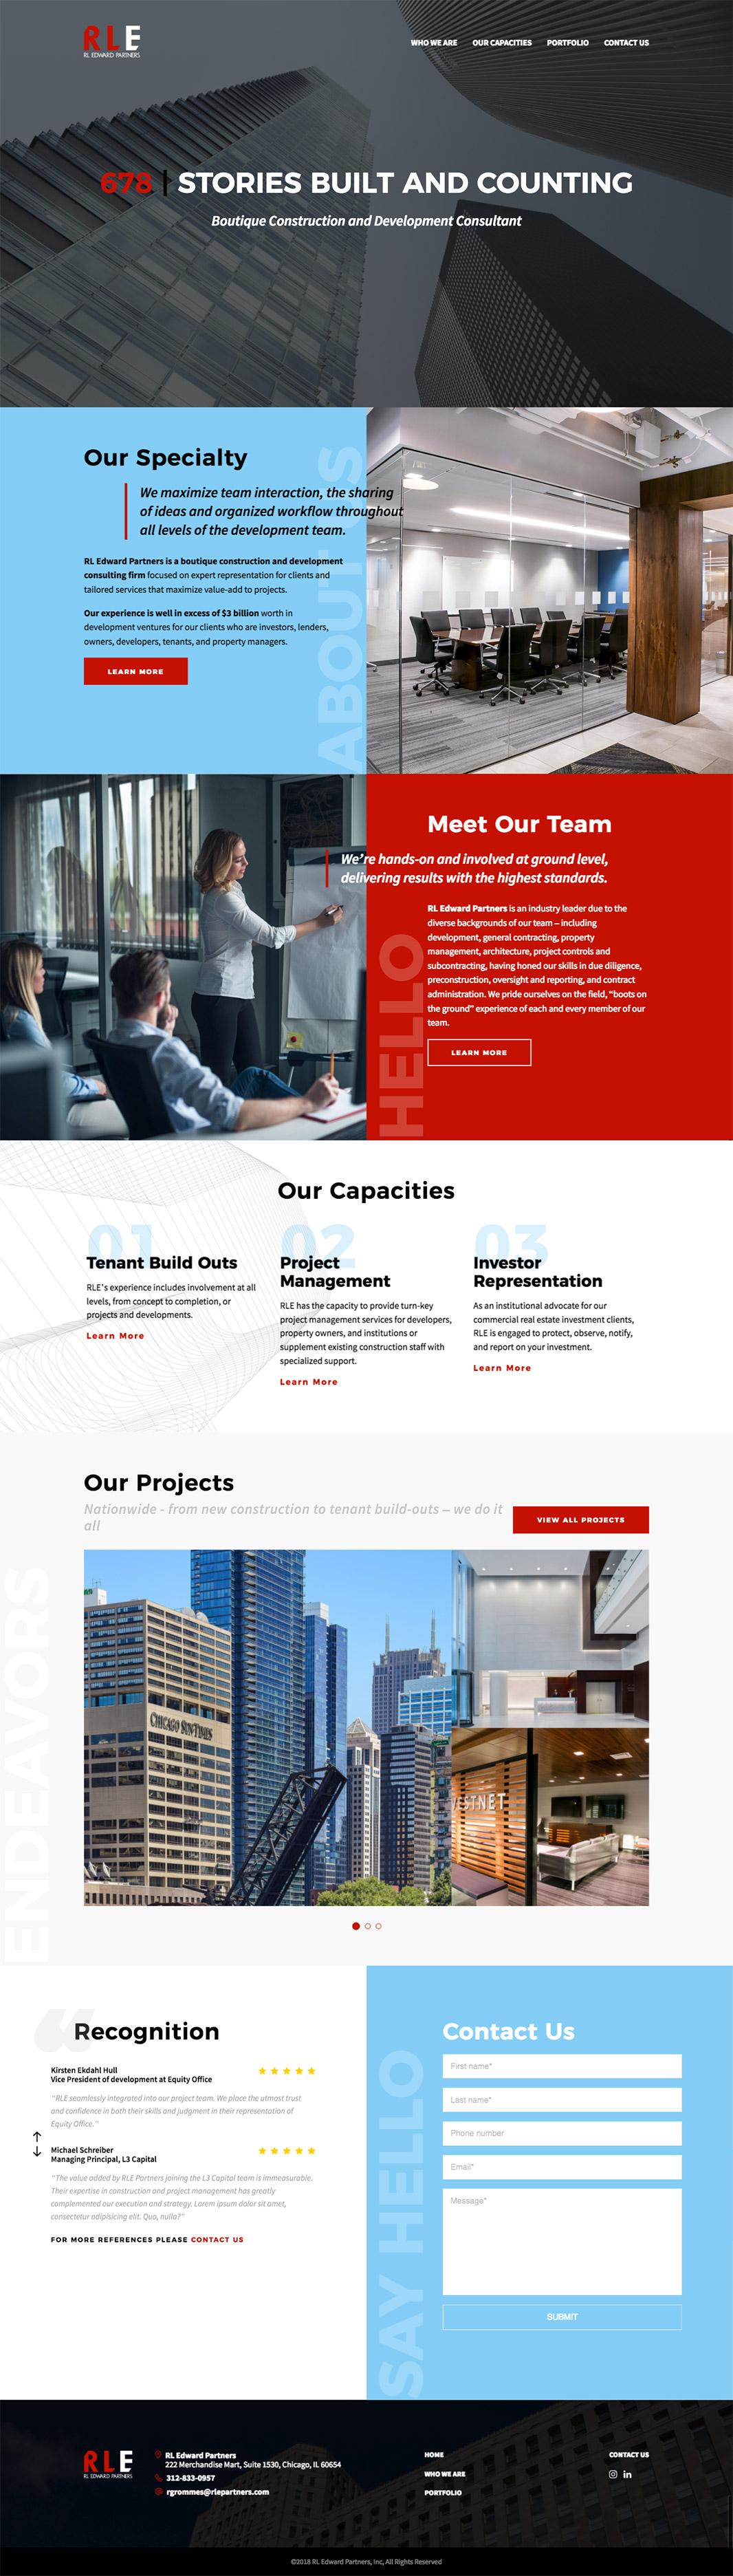 RL Edward Partners Homepage